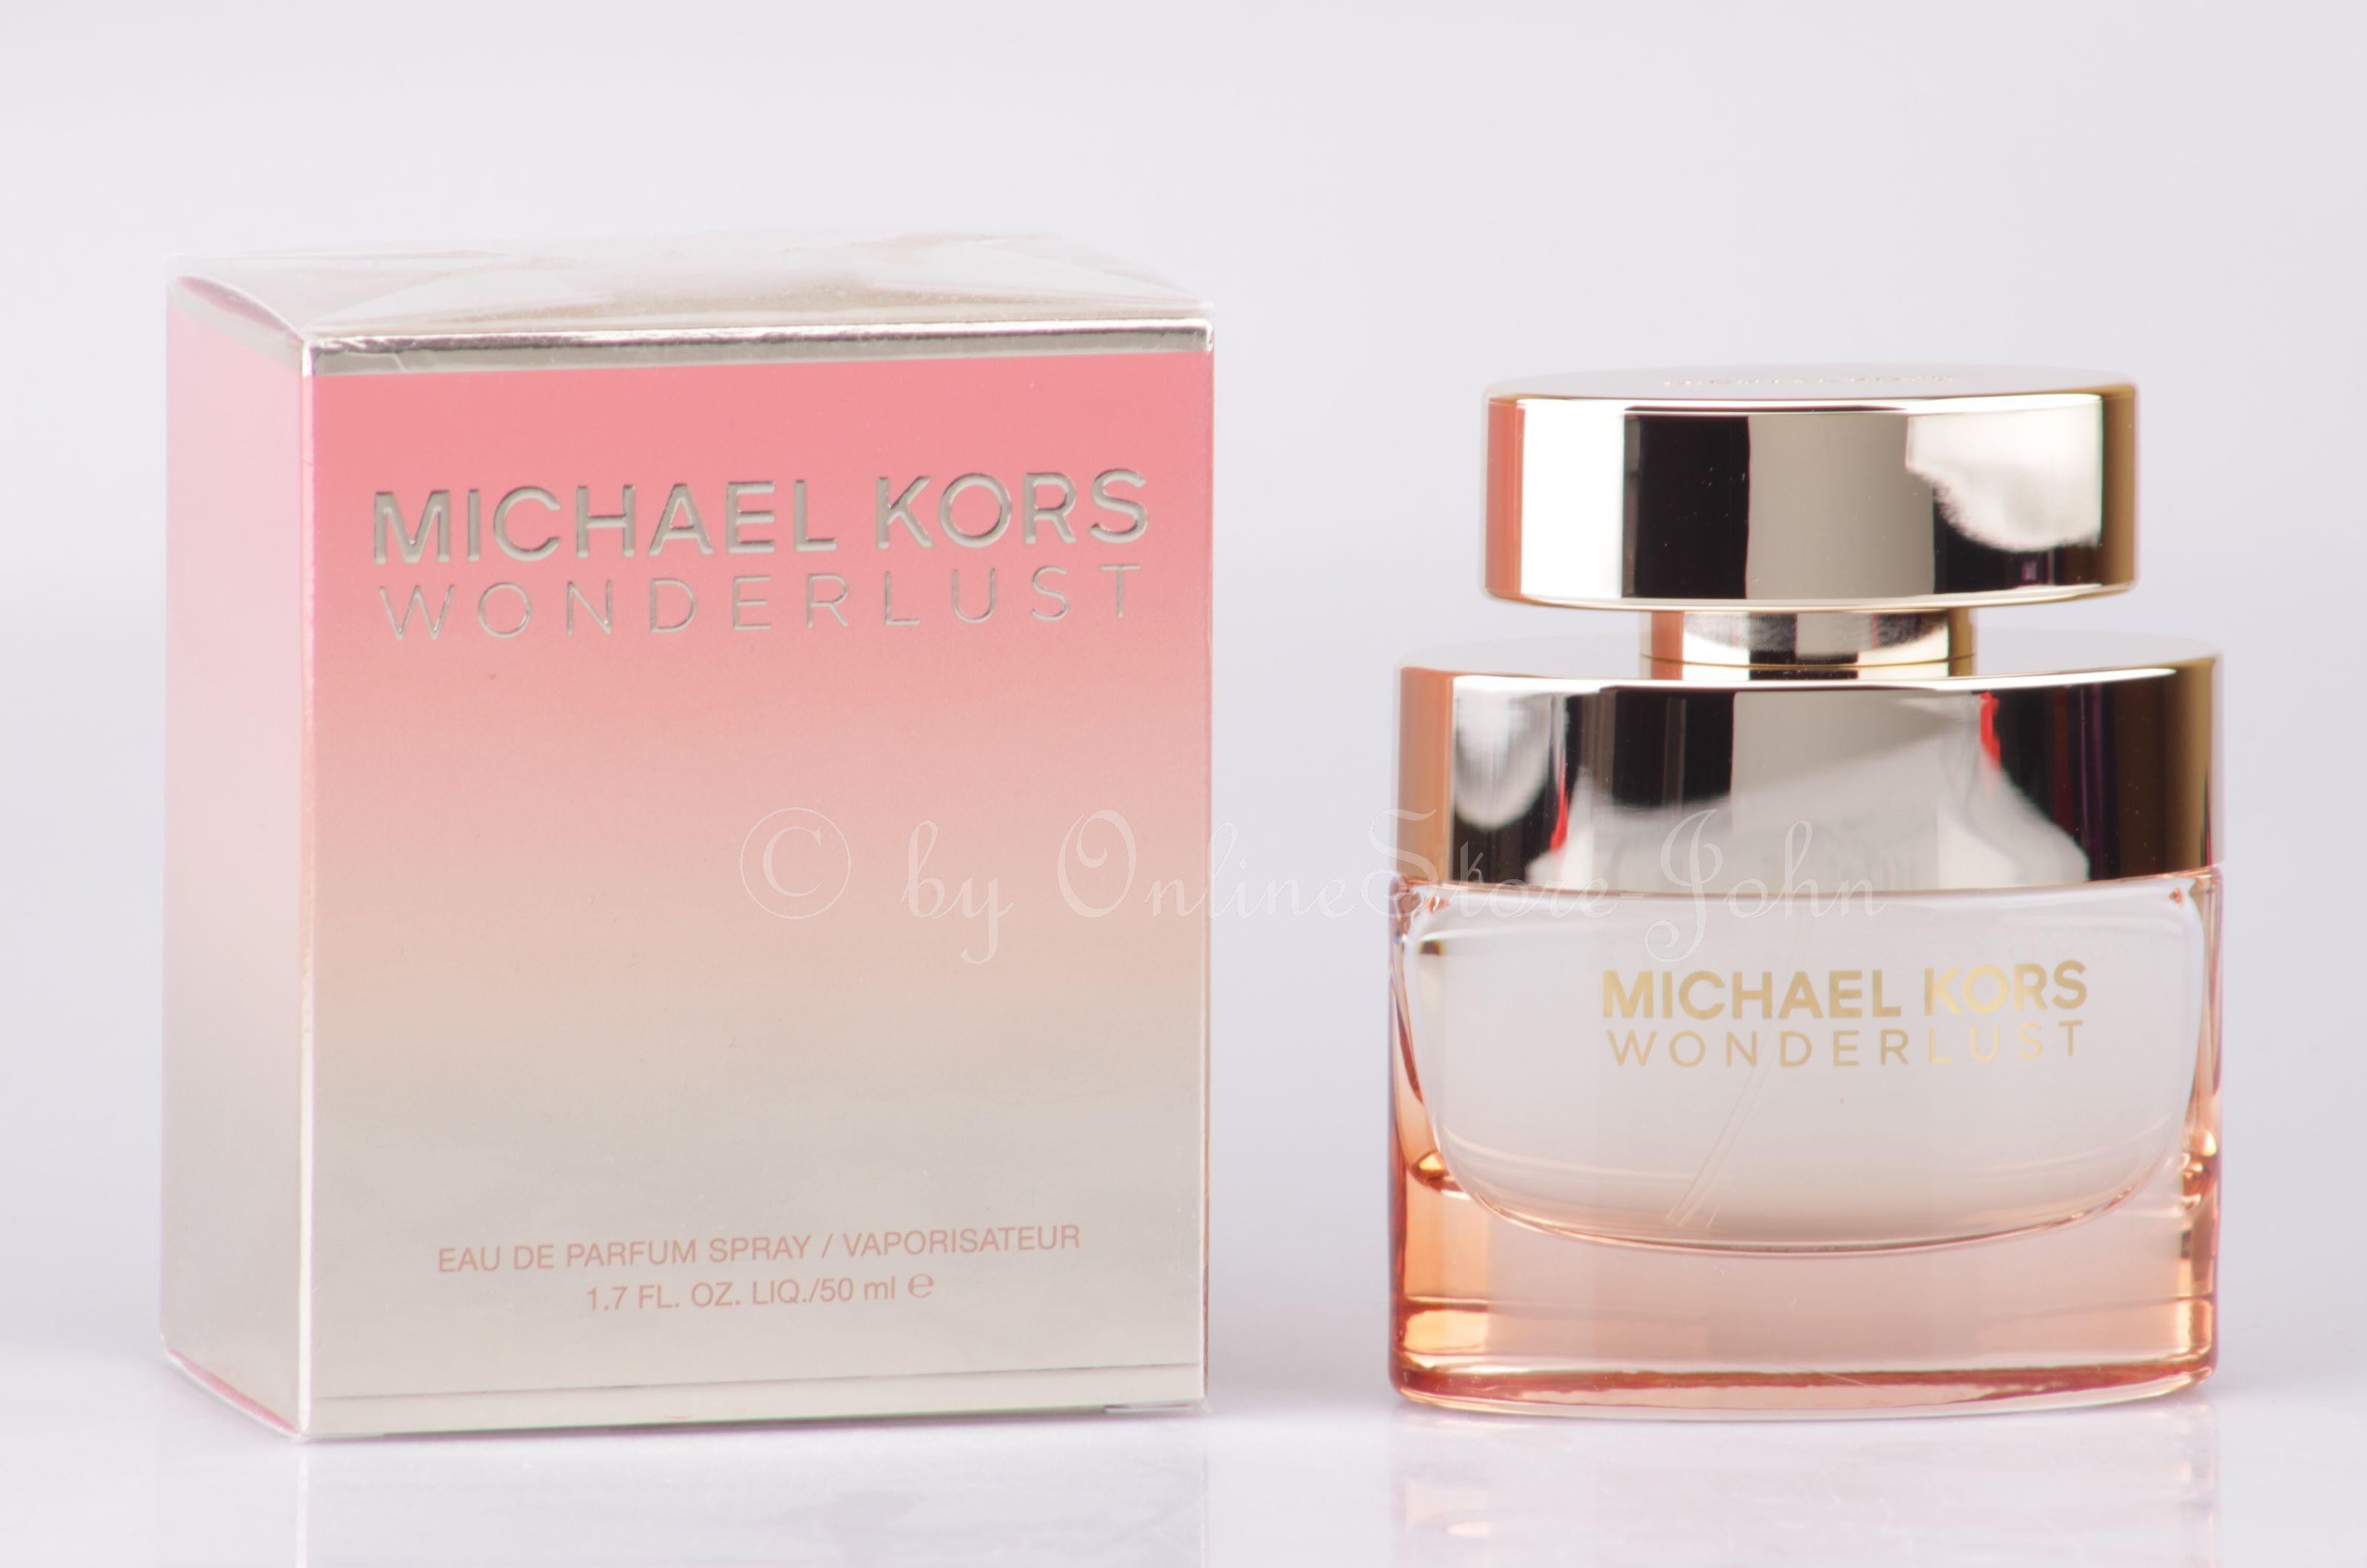 304febe1a73161 Michael Kors - Wonderlust - 50ml EDP Eau de Parfum